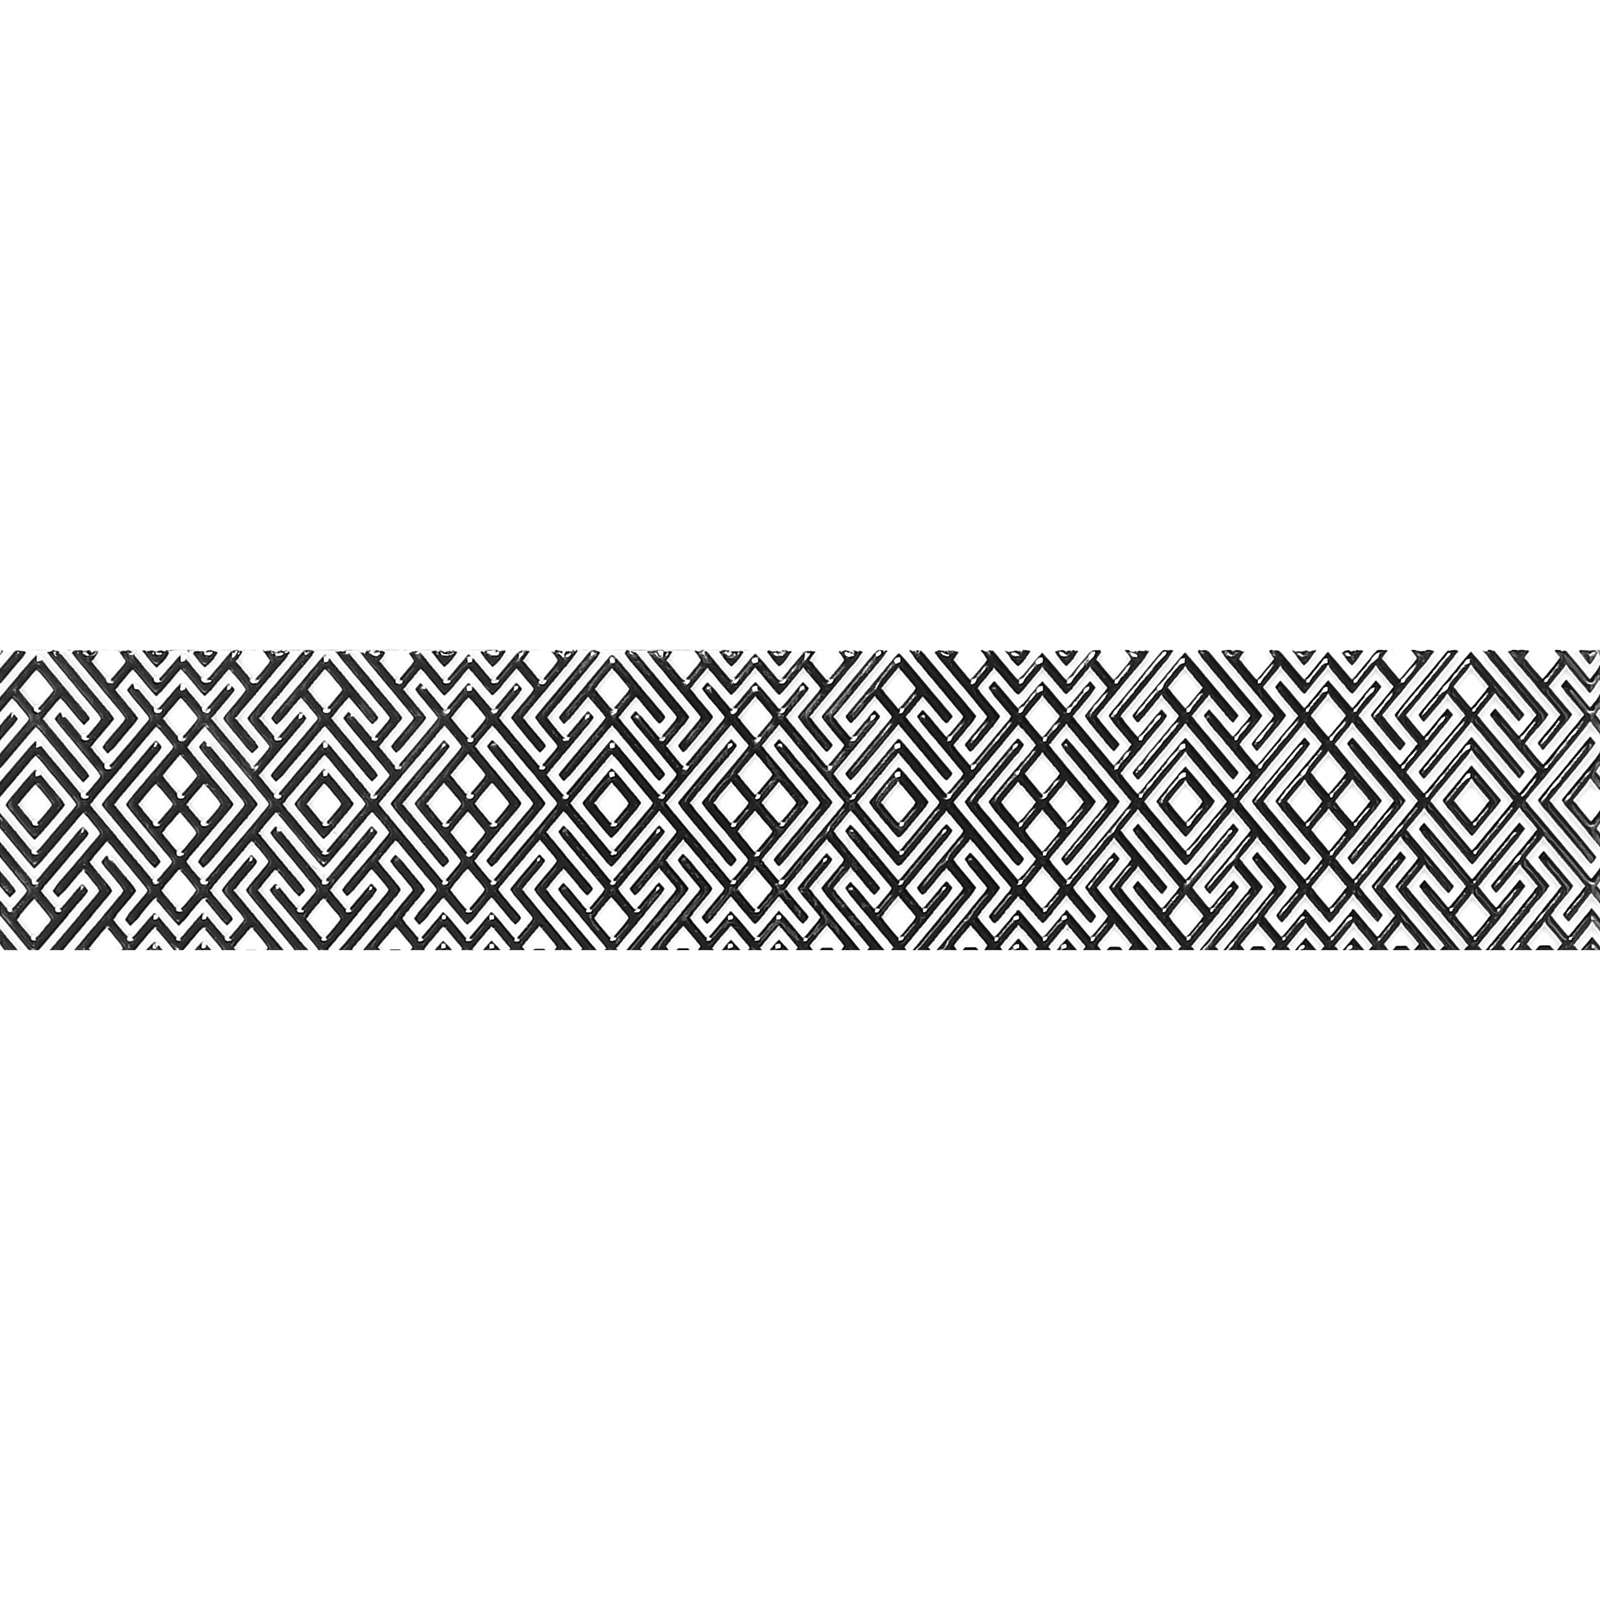 Бордюр 400х75мм Камелия черный 01, Шахты